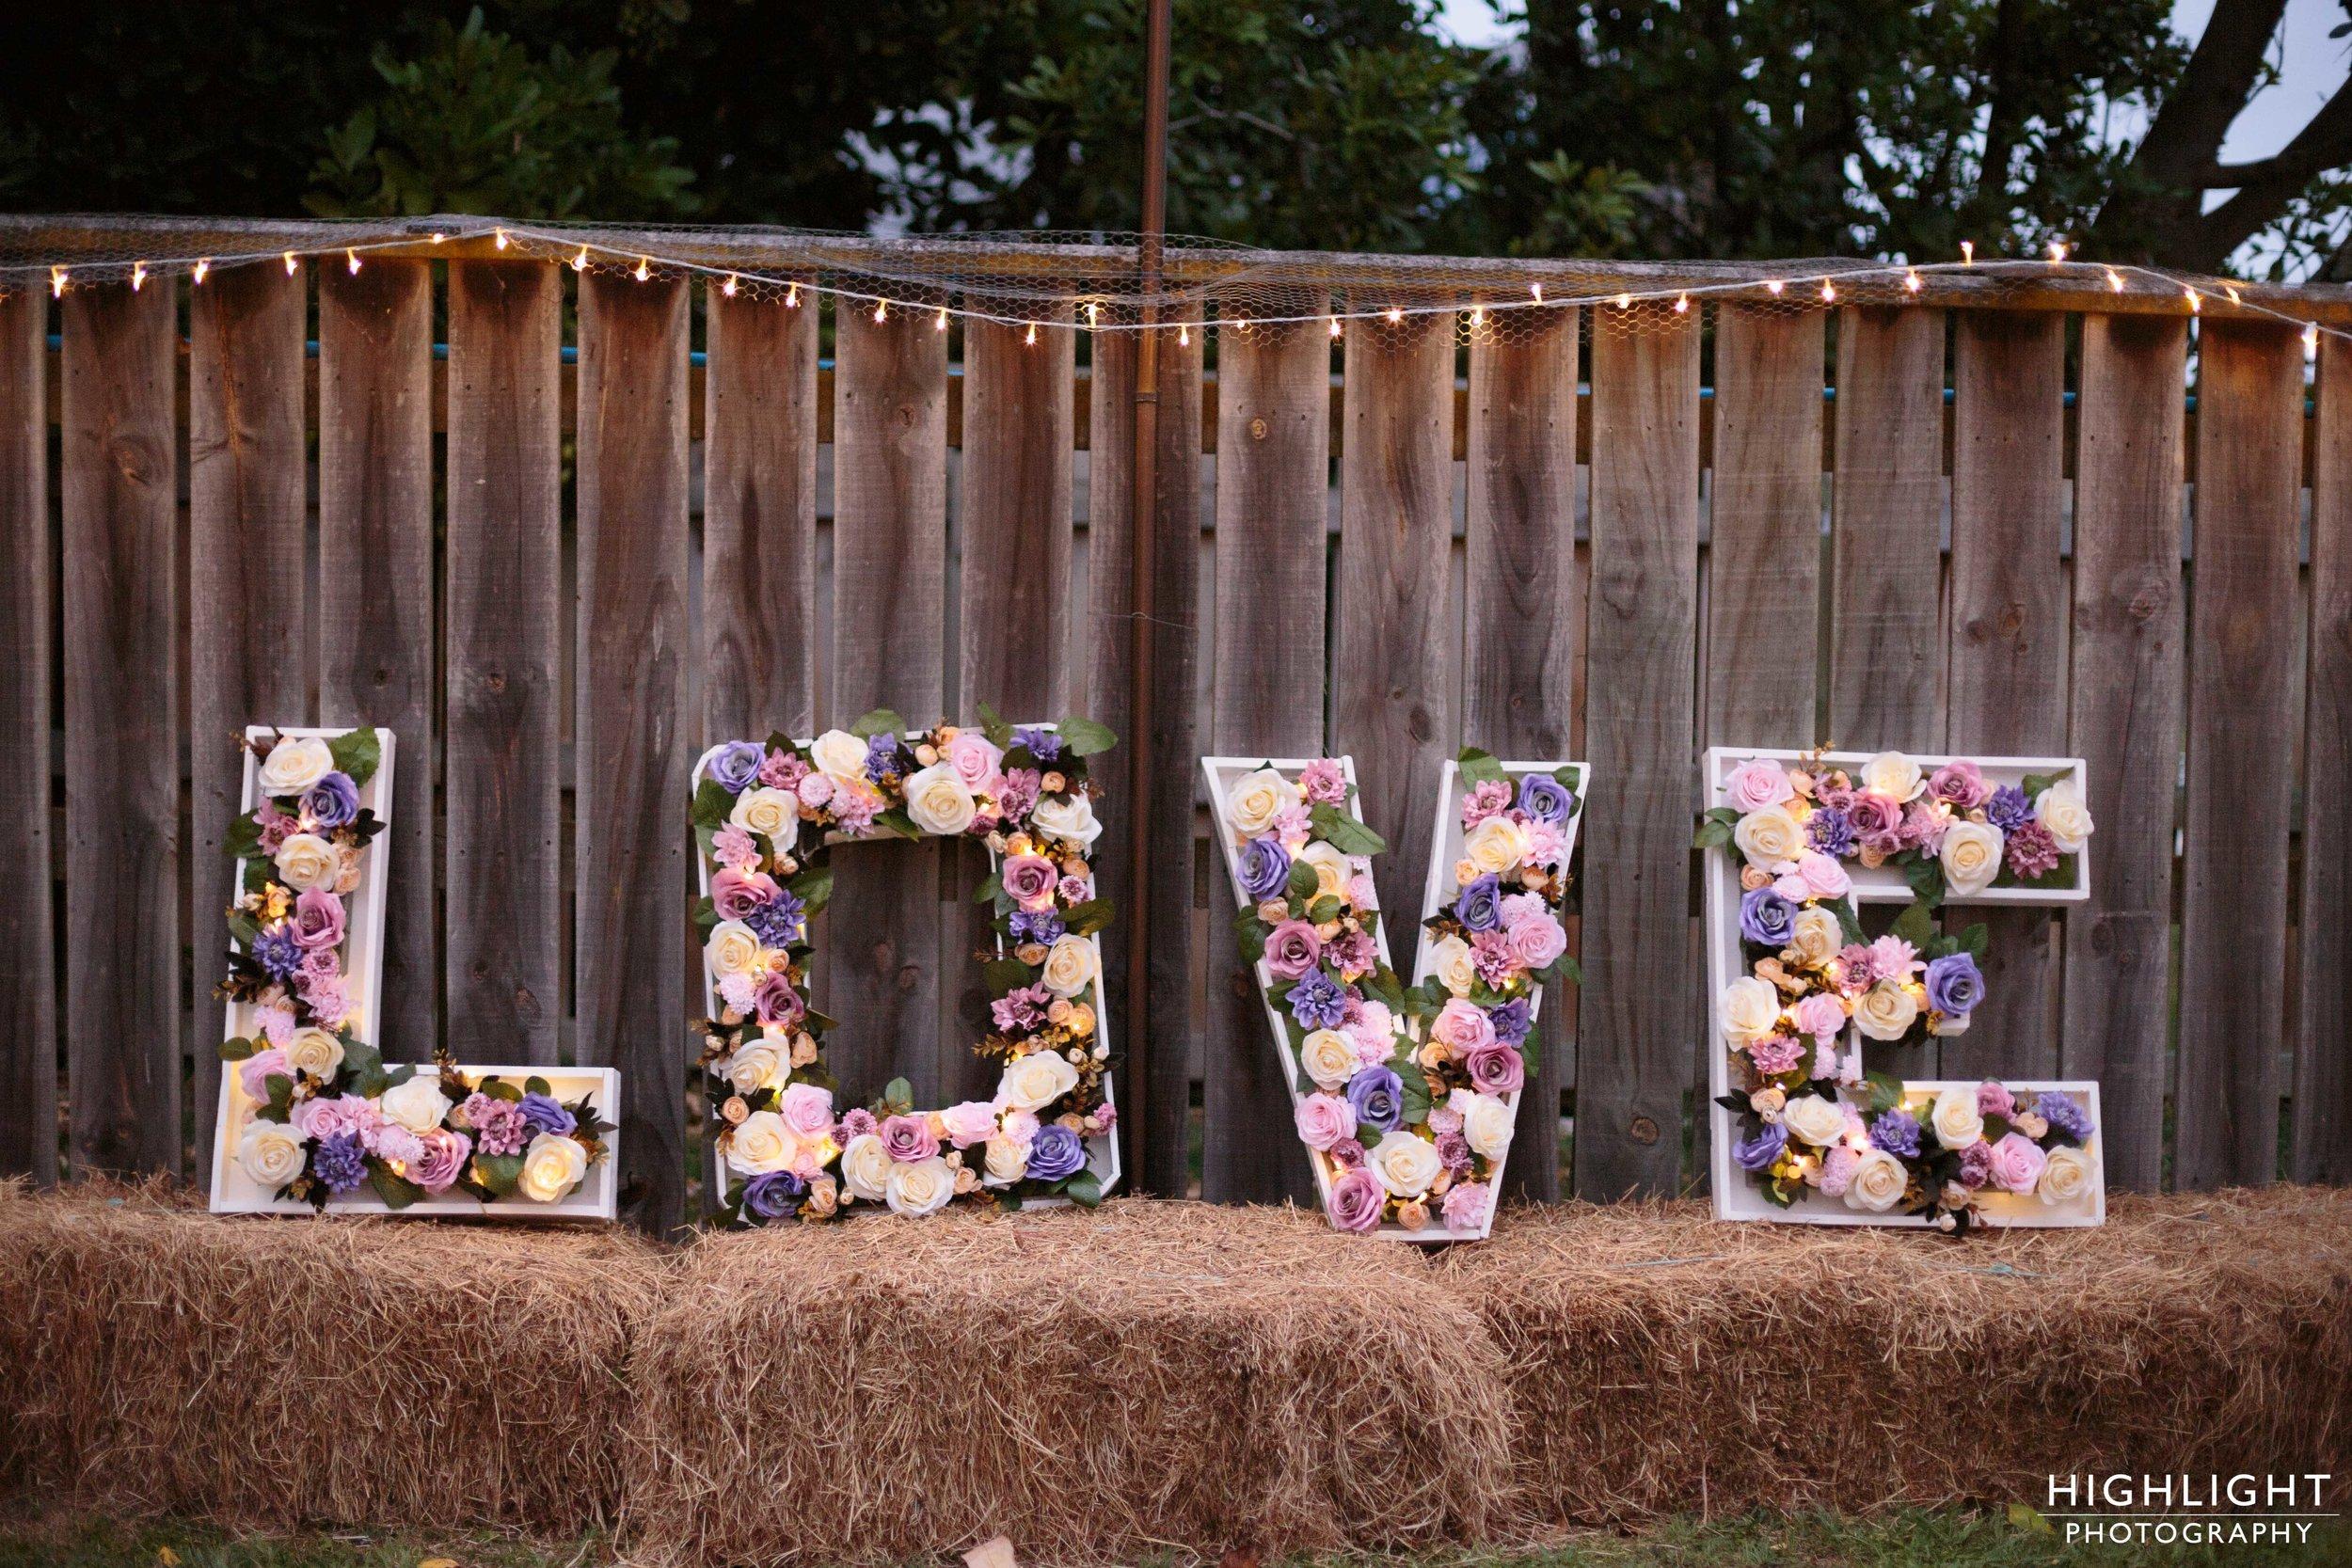 JM-2017-Highlight-wedding-photography-palmerston-north-new-zealand-243.jpg